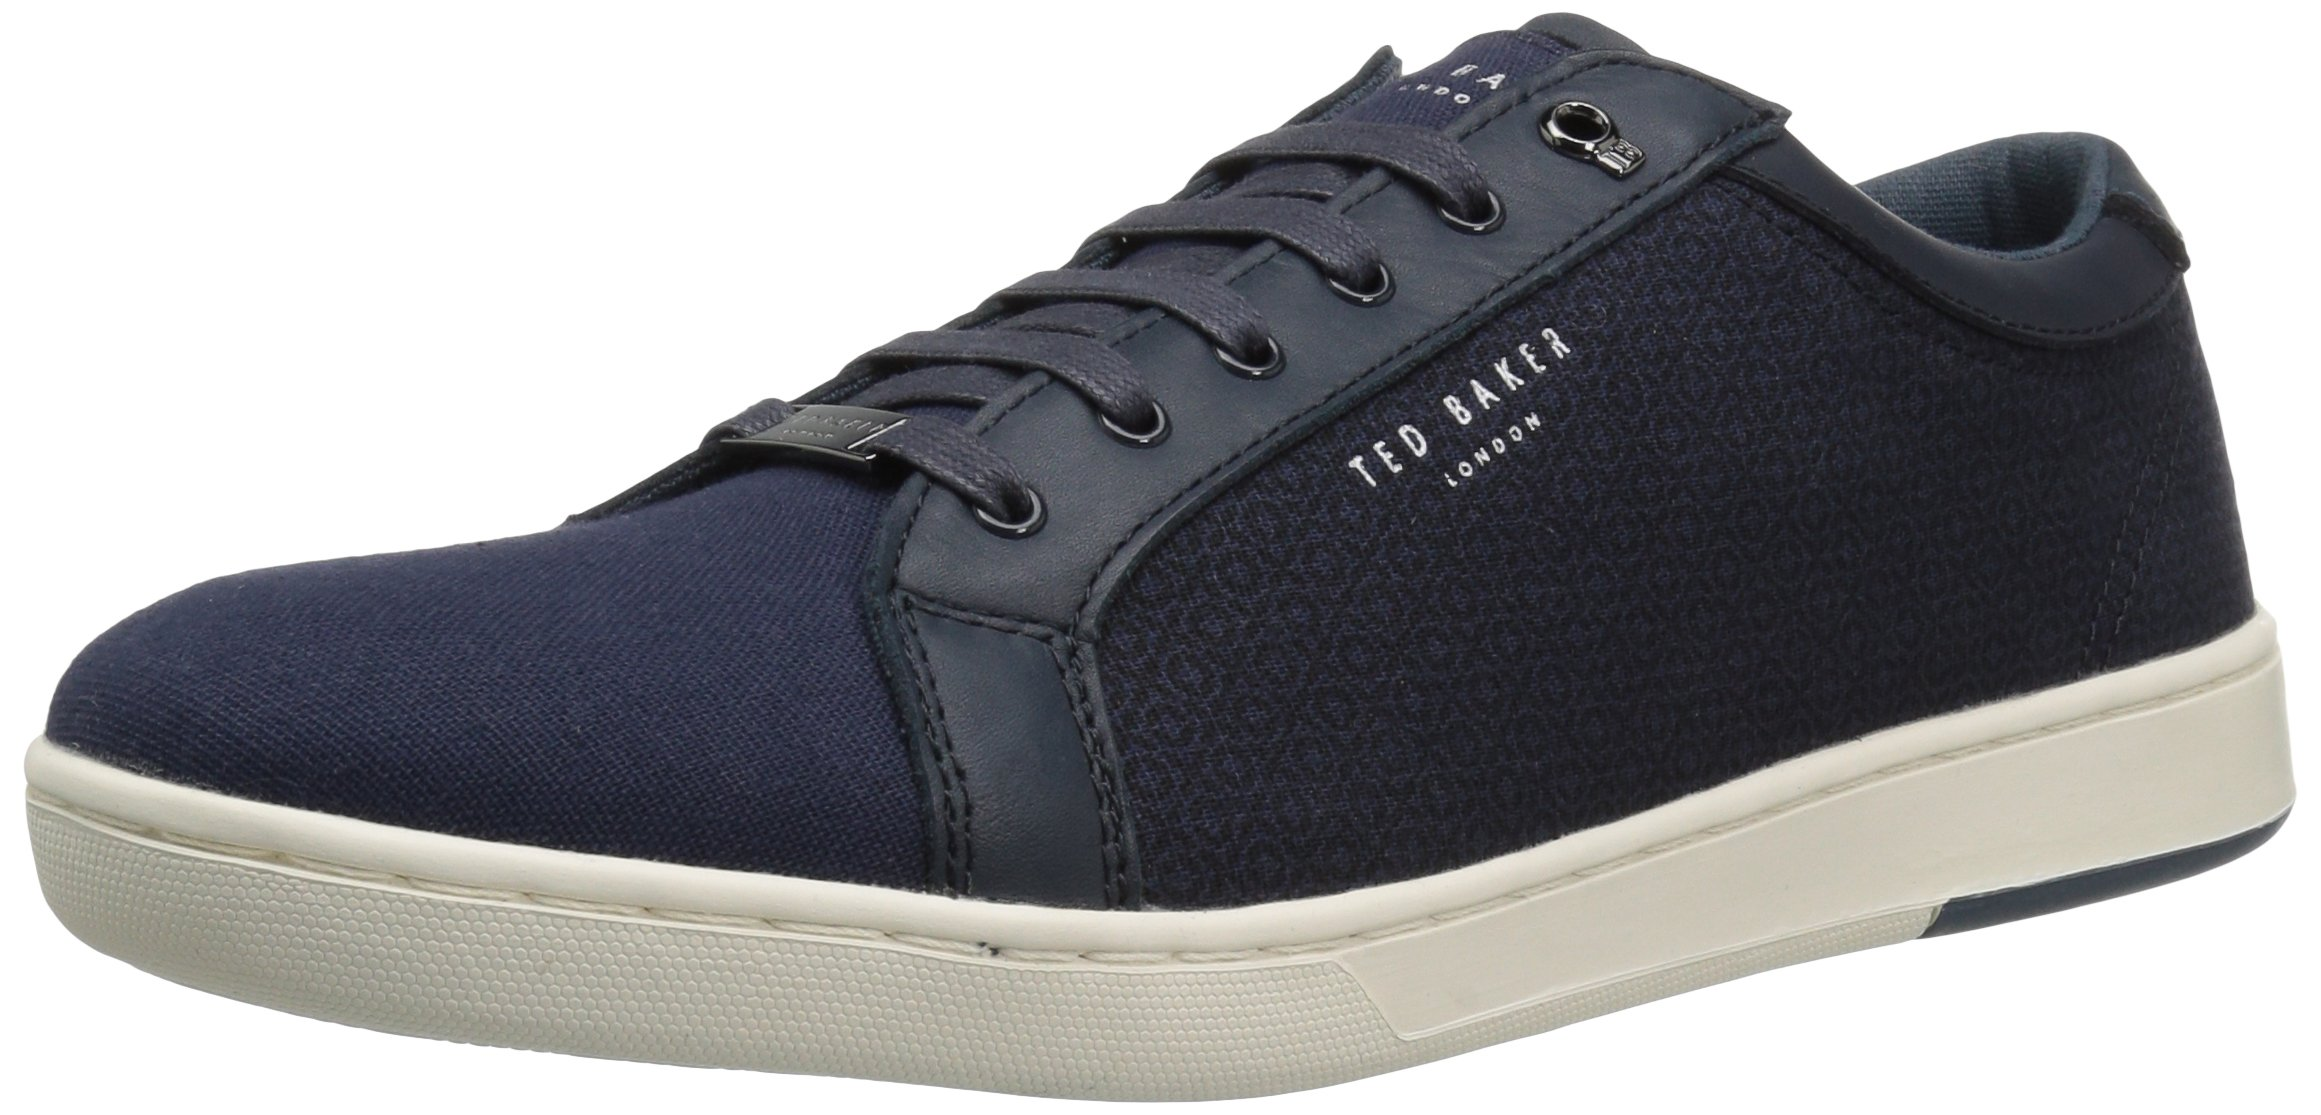 Ted Baker Men's Ternur Sneaker, Dark Blue, 8 D(M) US